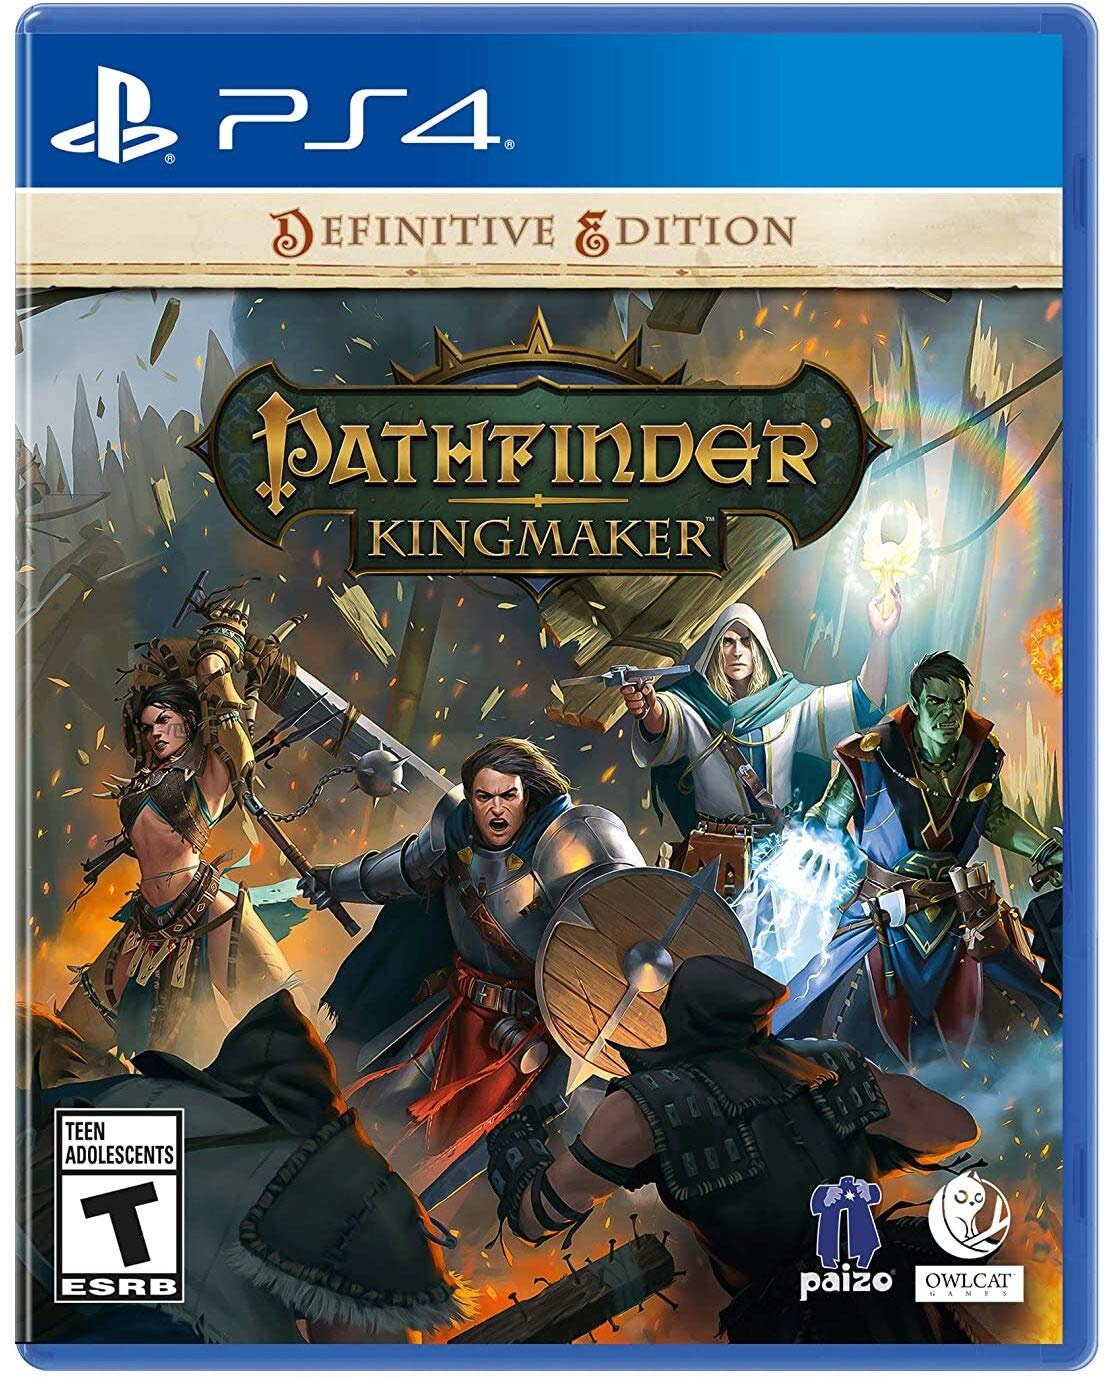 Pathfinder: Kingmaker Definitive Edition (PS4) $19.99 ~ Amazon or Best Buy